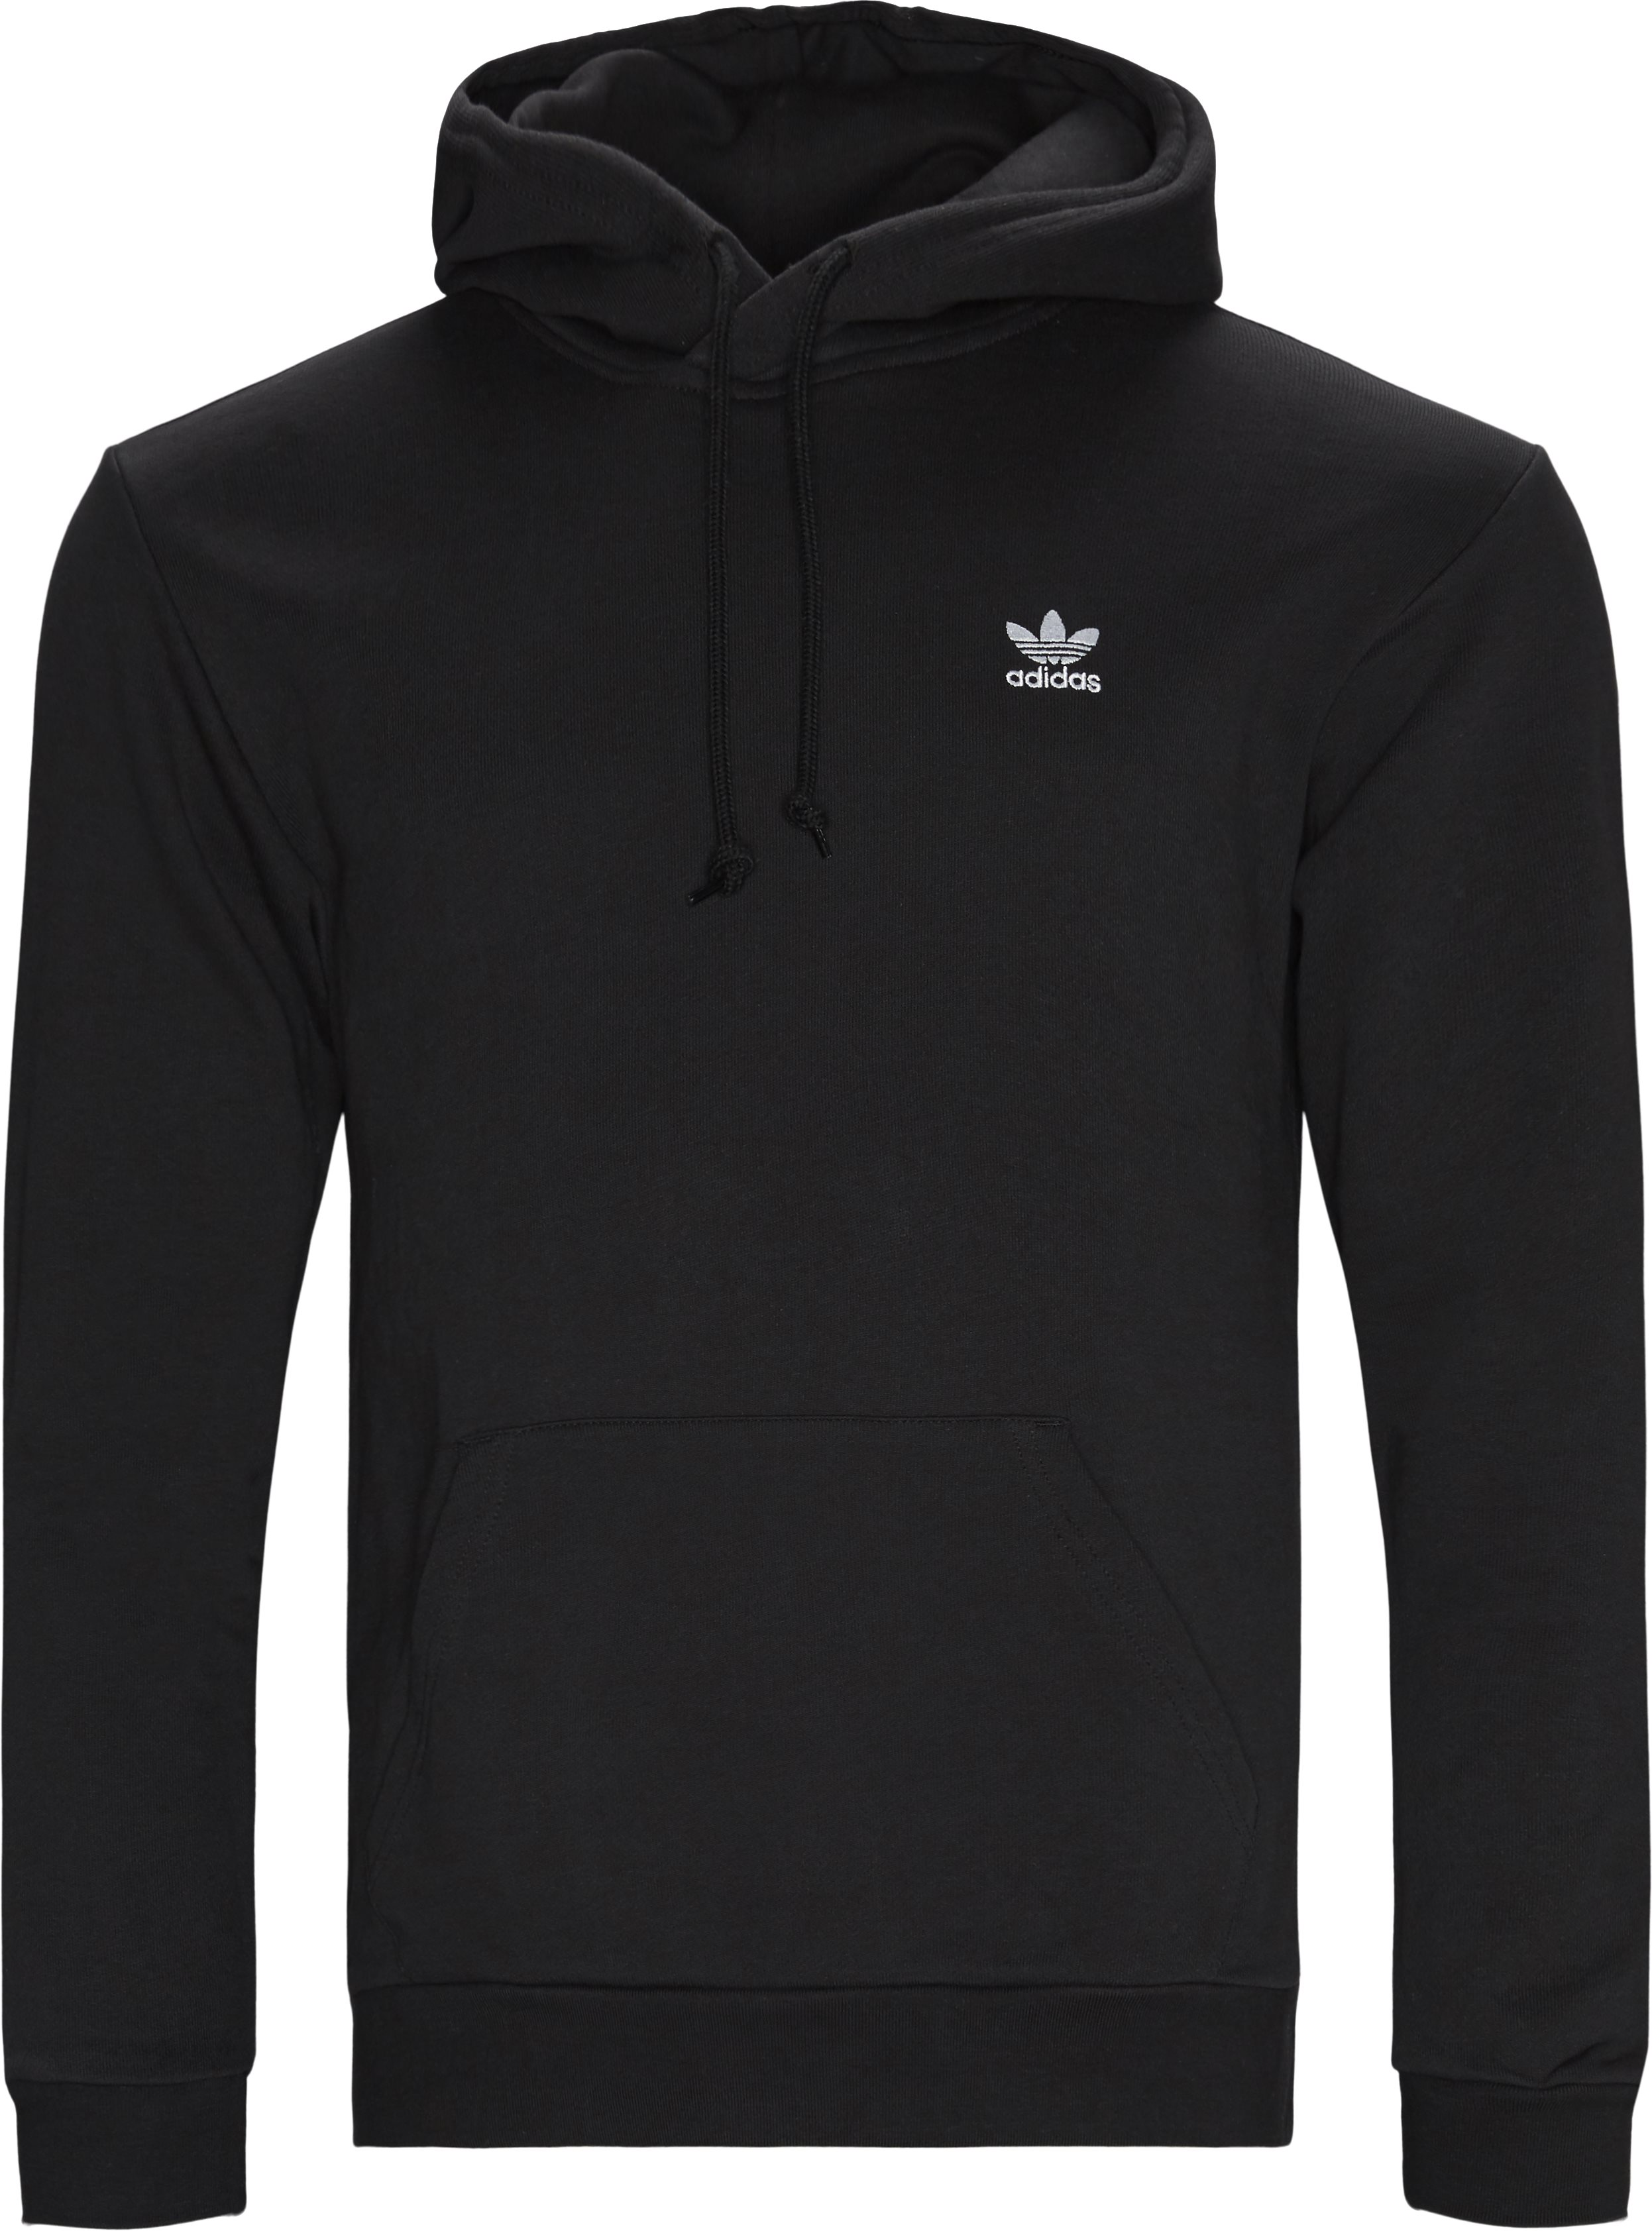 Essential Hoody - Sweatshirts - Regular - Sort